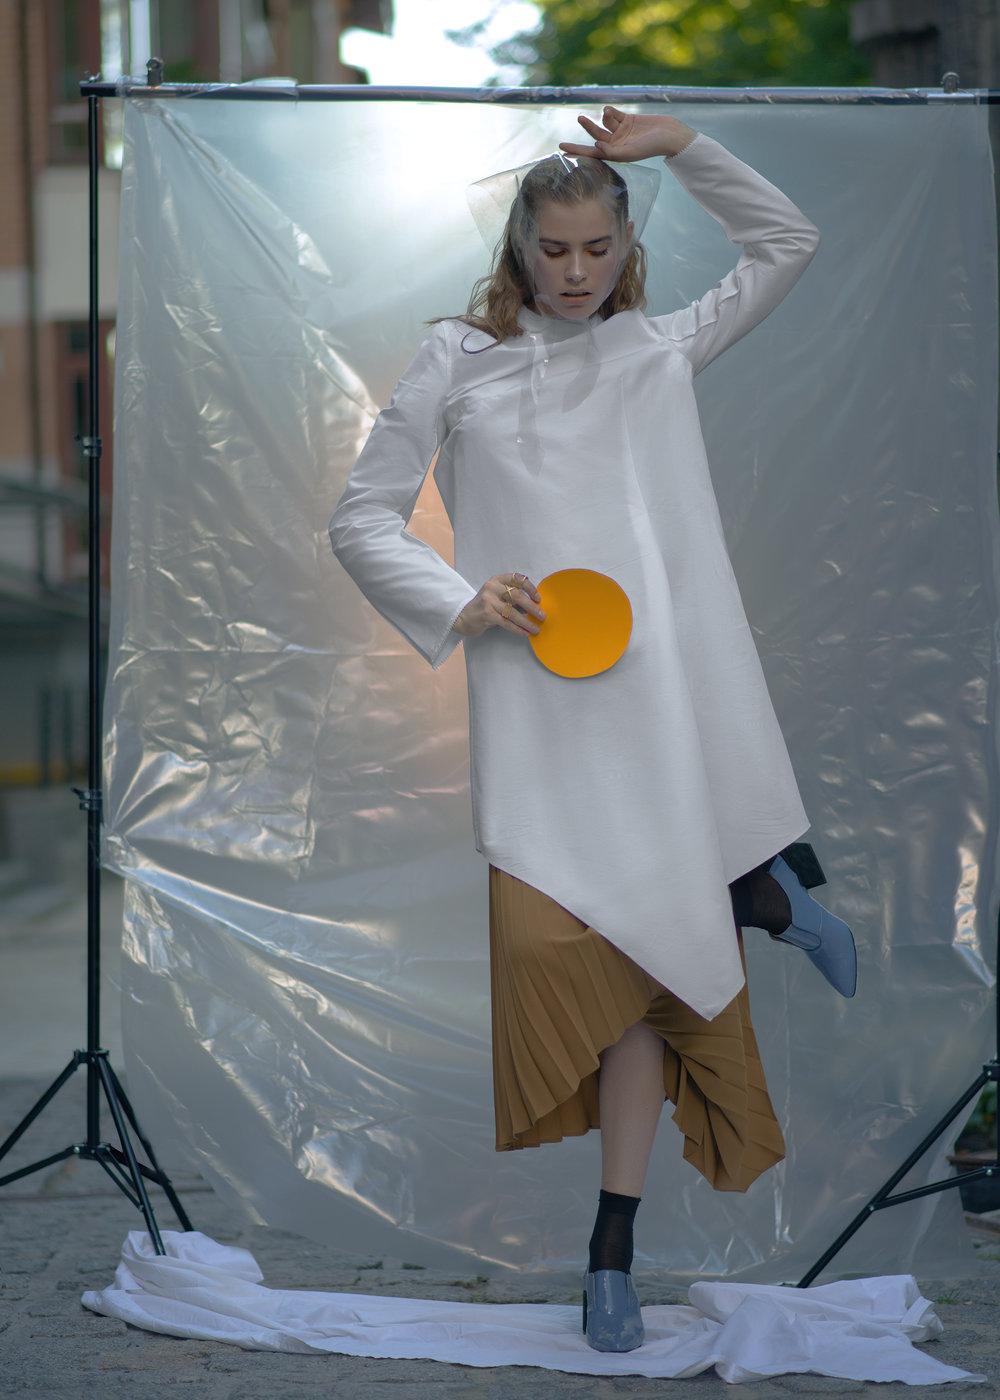 Dress PRZHONSKAYA Skirt FLOW THE LABEL Babushka Stylist's own Rings ABCDRINGS Shoes PRZHONSKAYA & ALI SAULIDI Socks Stylist's own